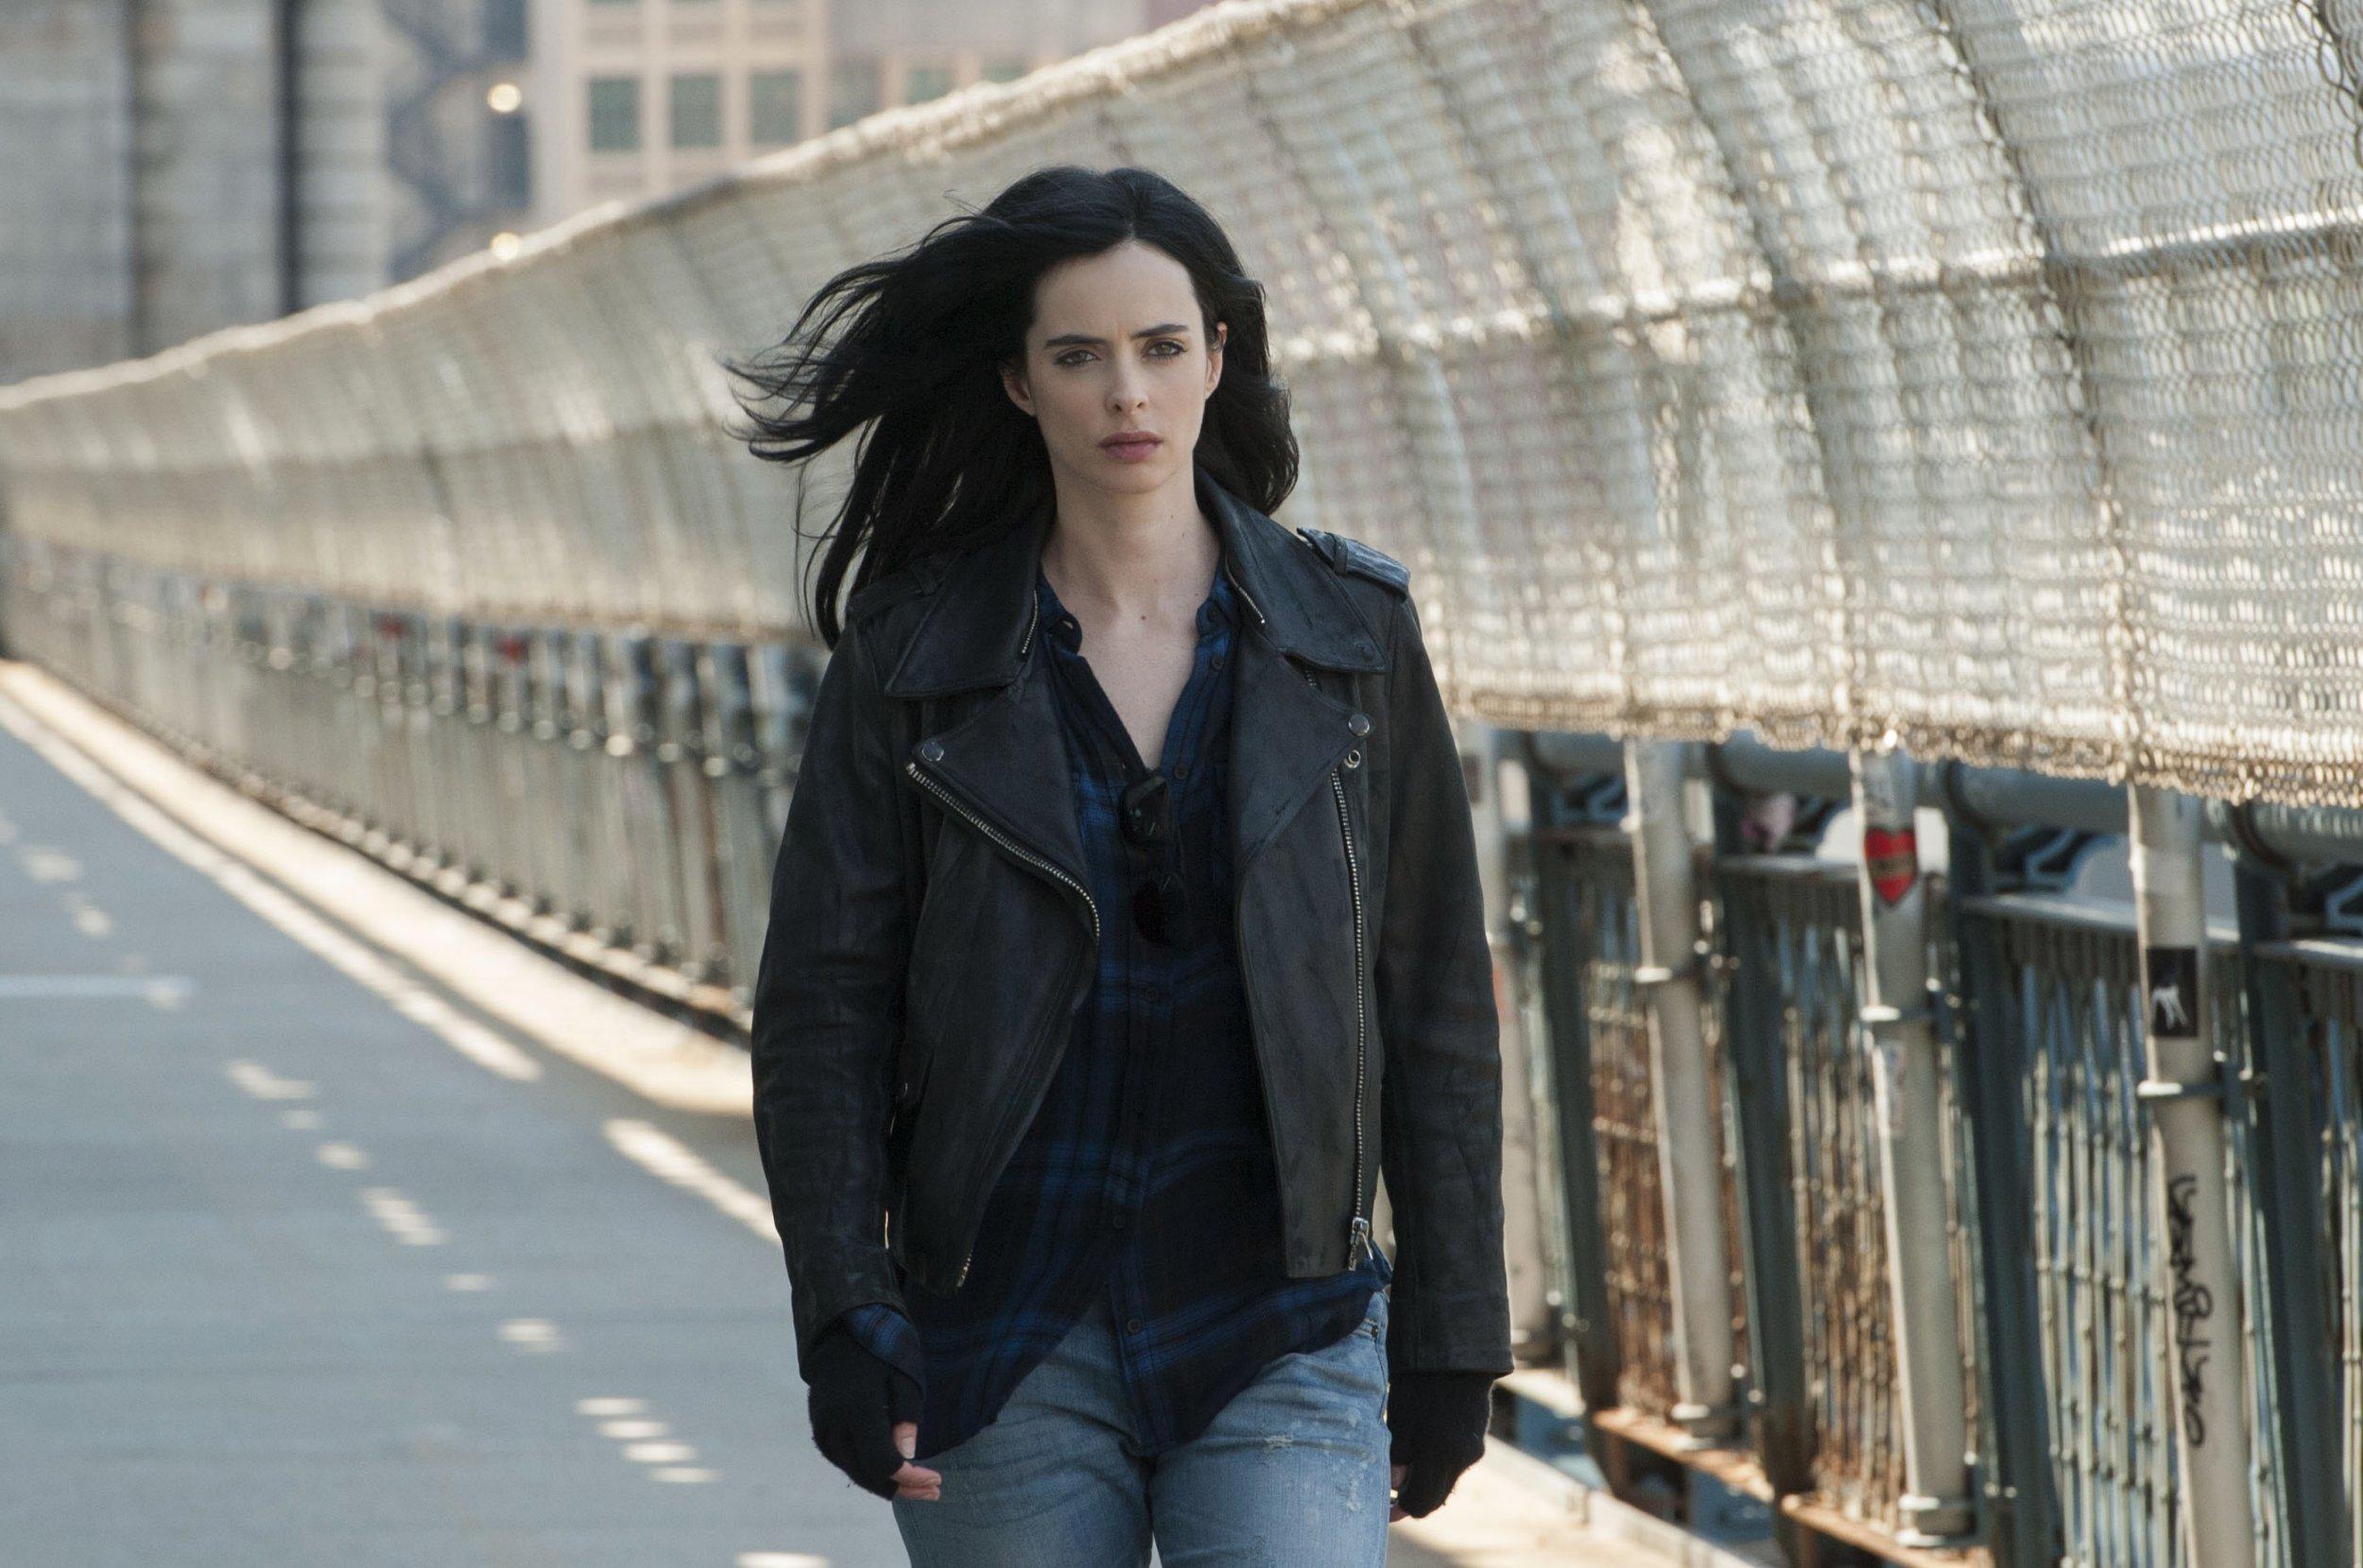 The Defenders catch-up: what happened in Jessica Jones?